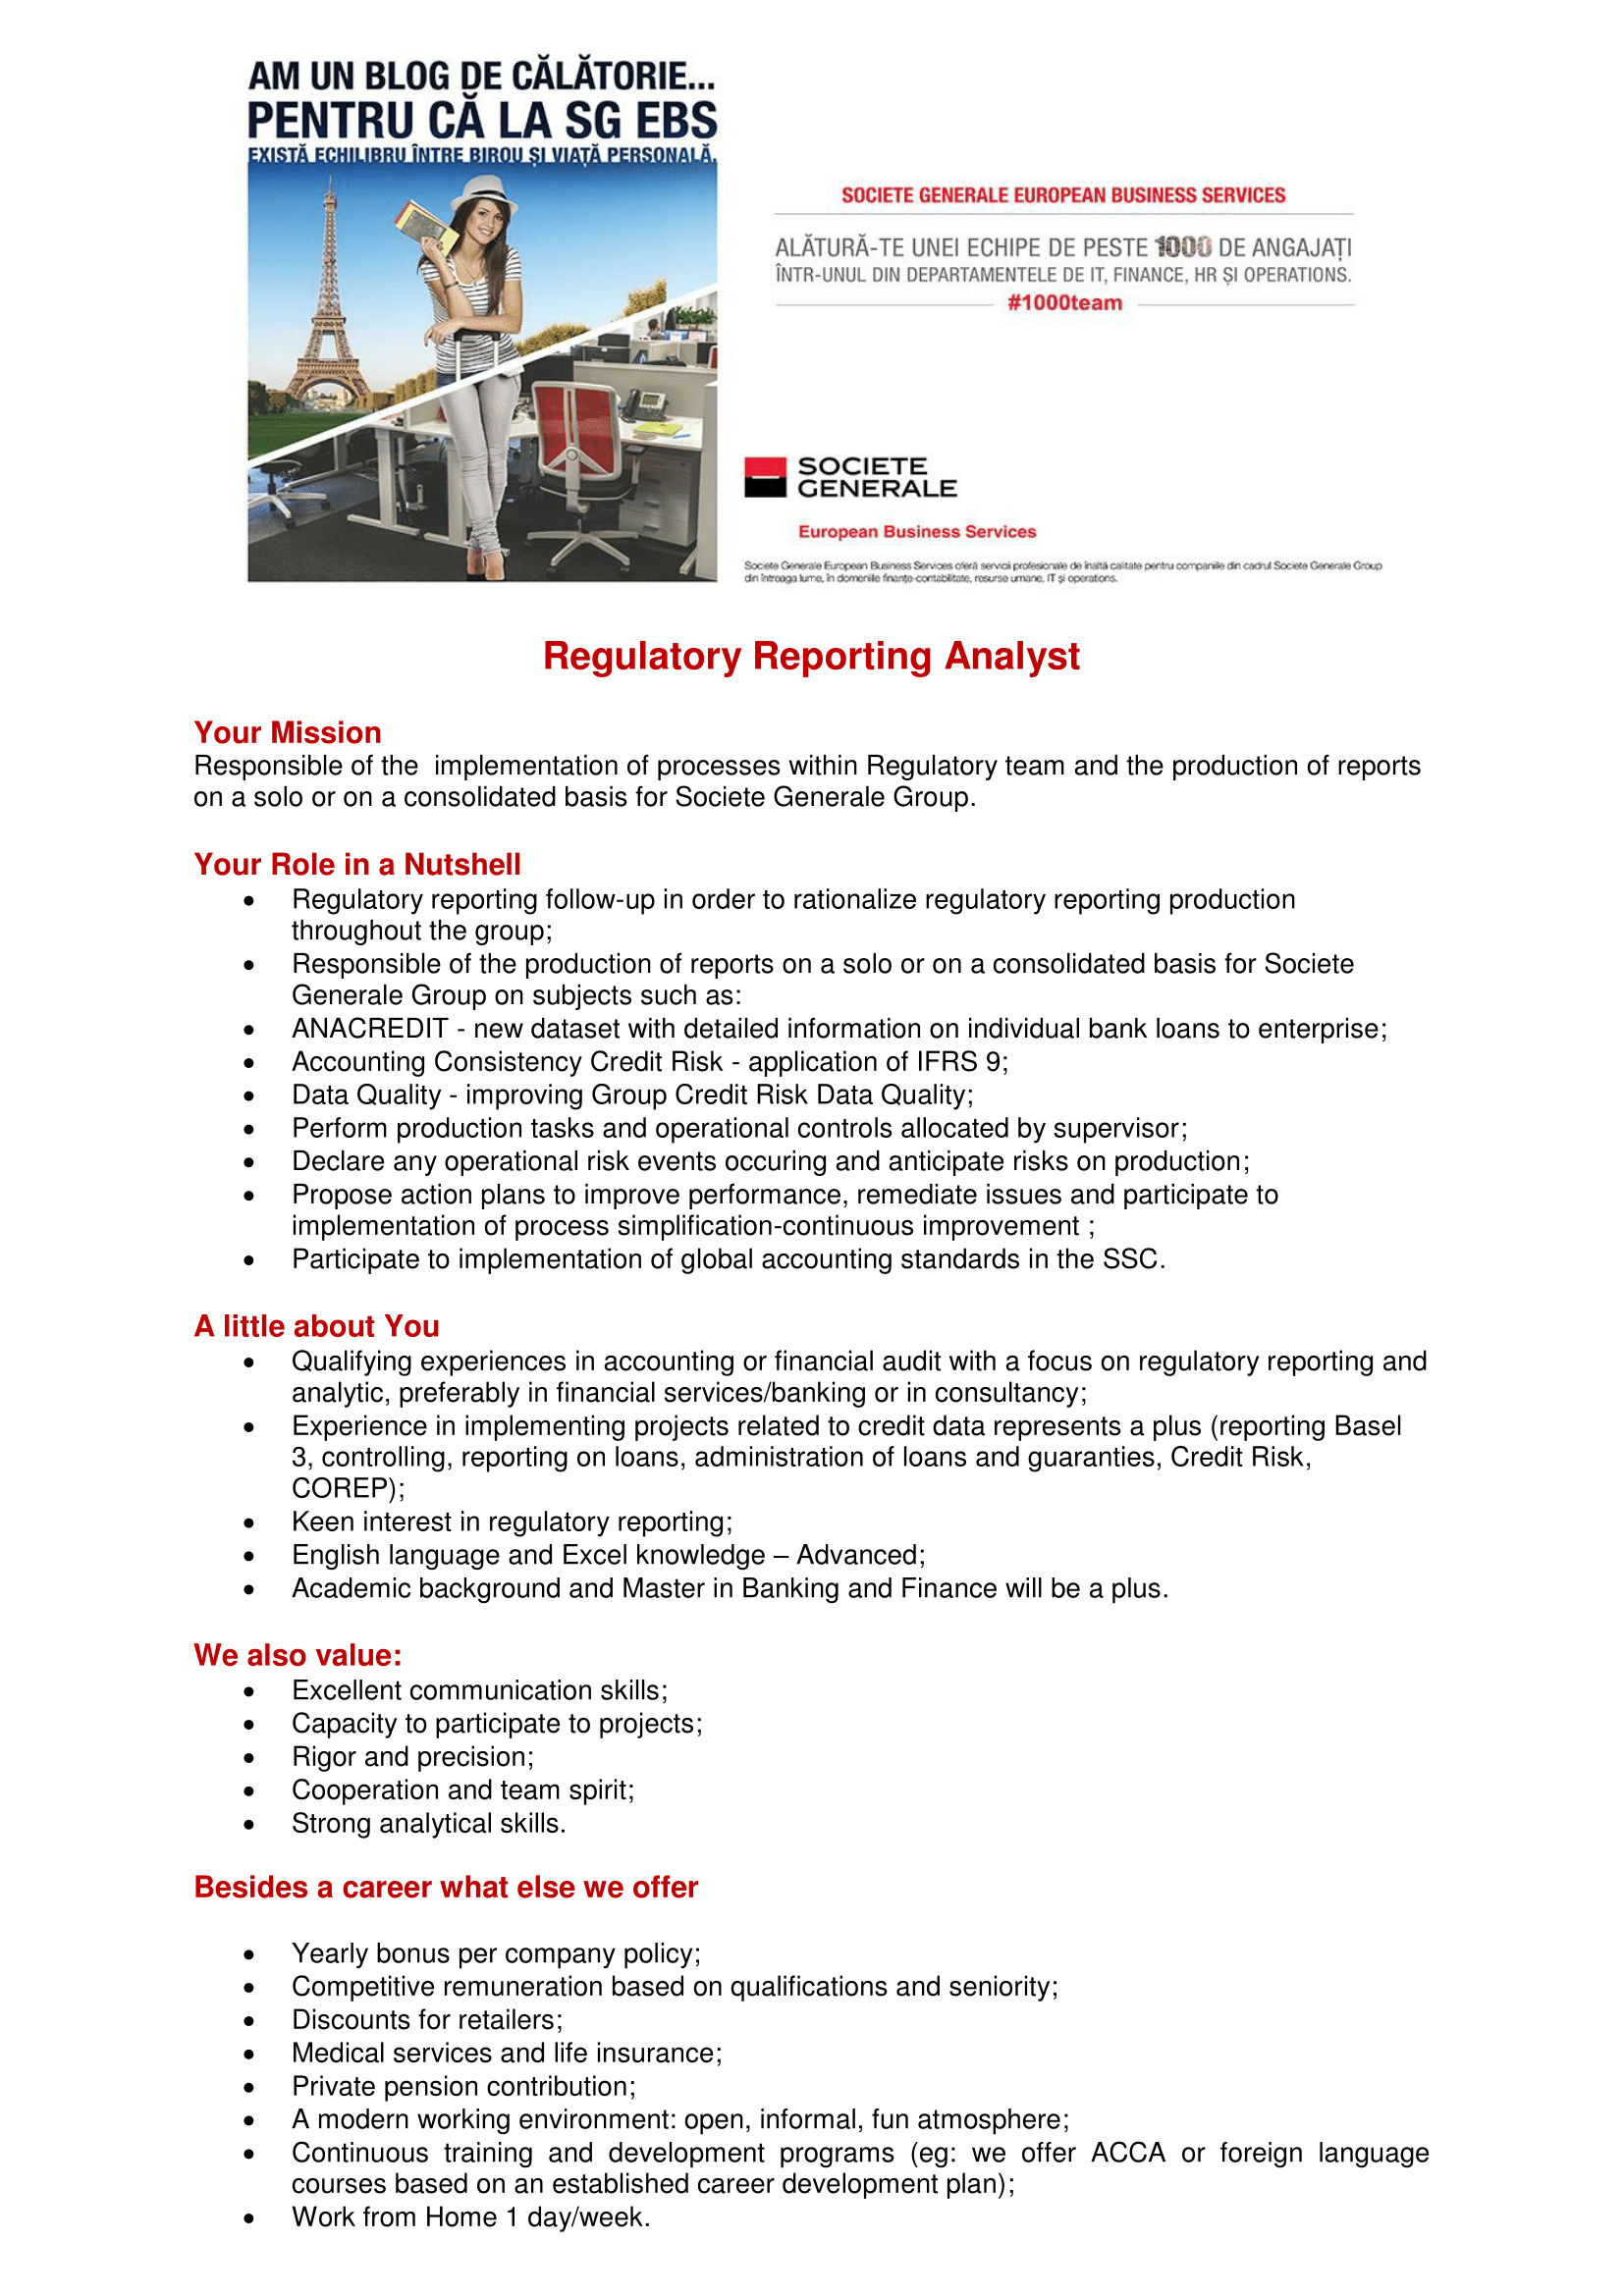 Regulatory Reporting Analyst_ebs site-1